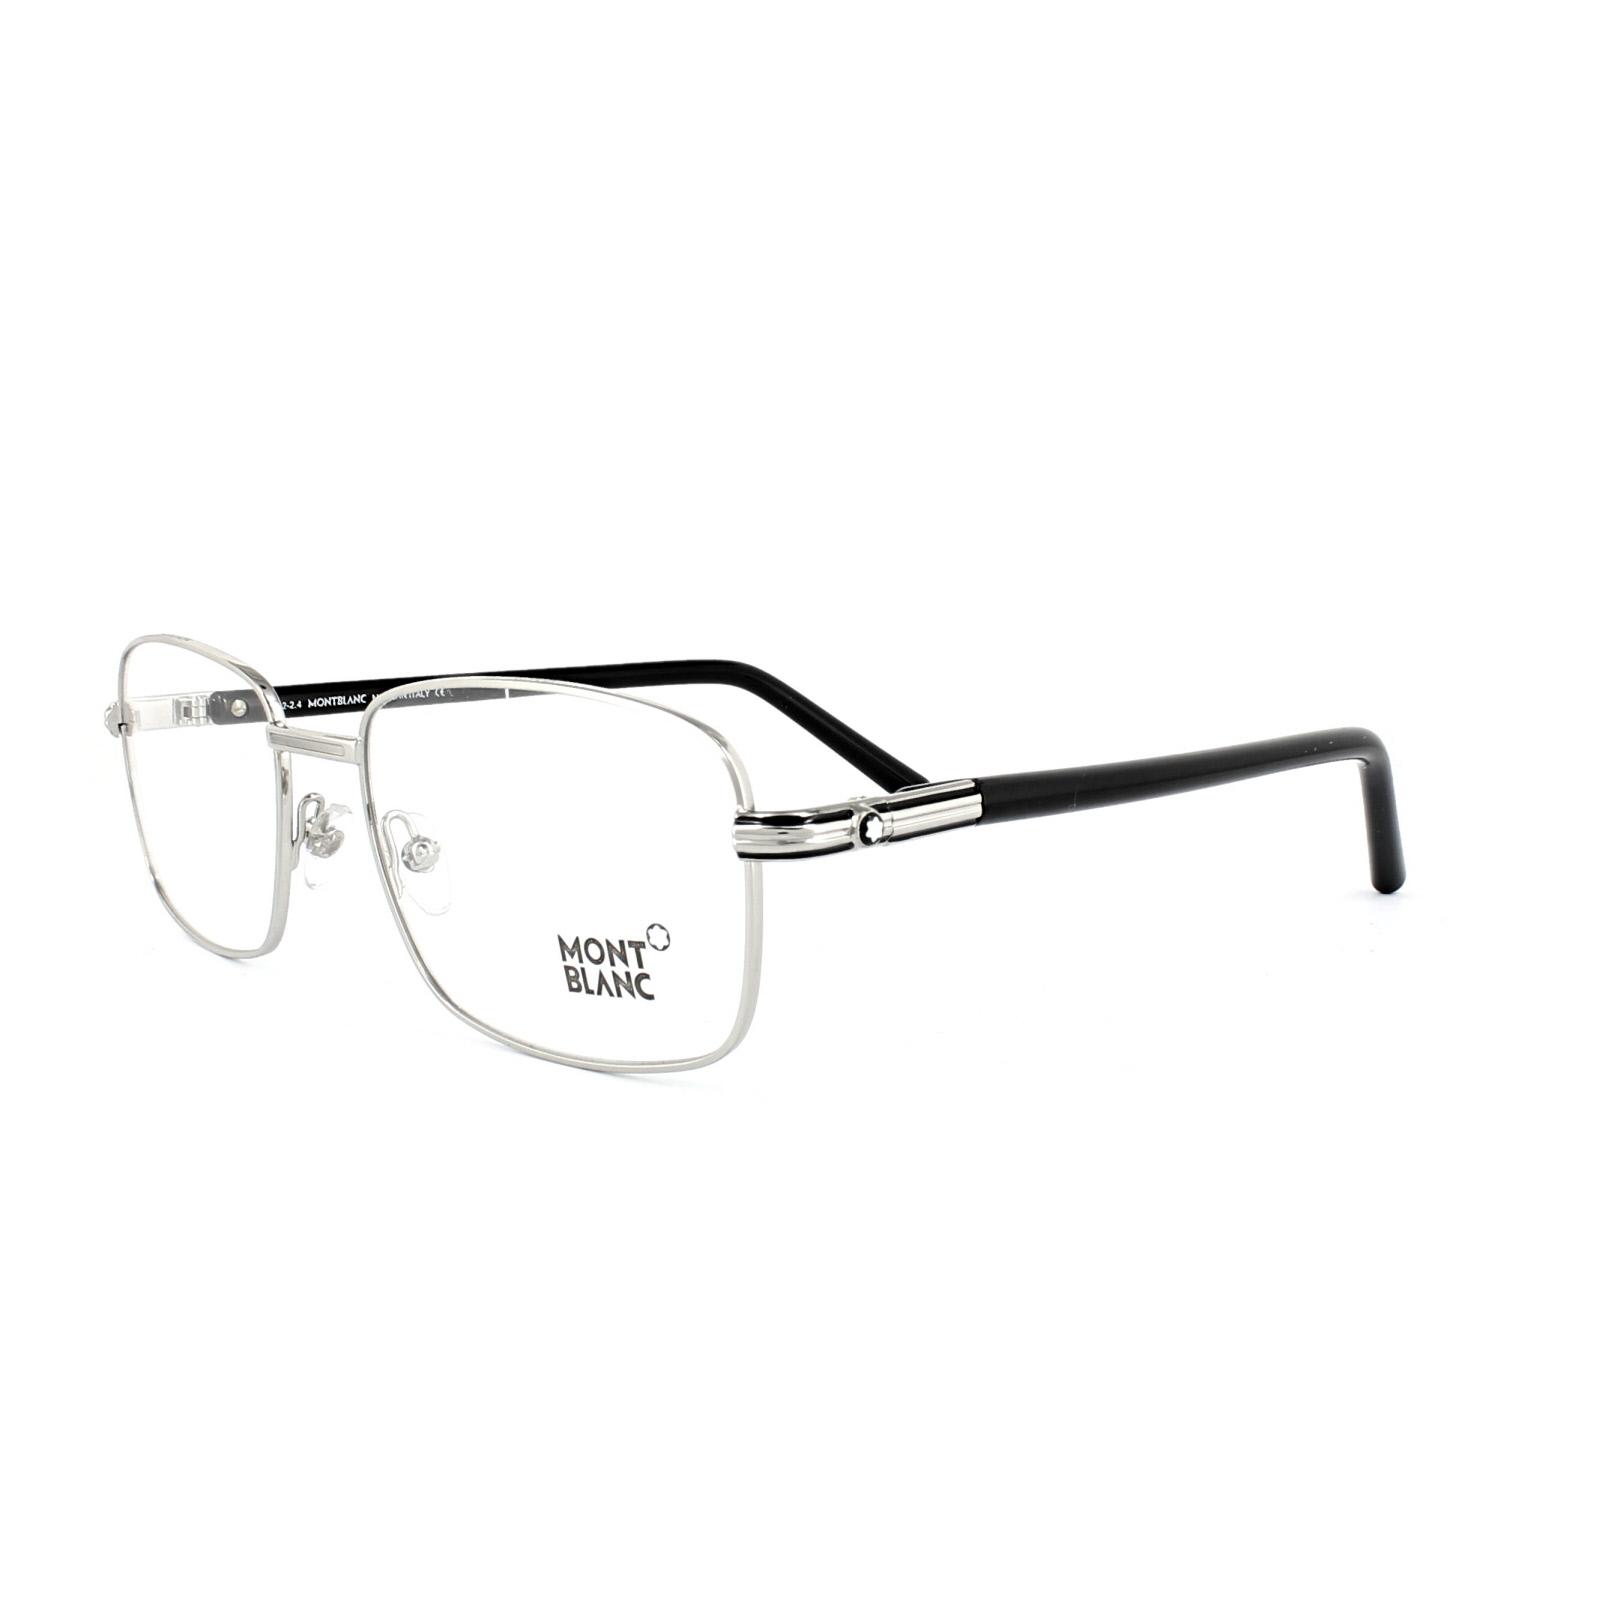 4cca6c4f659 Mont Blanc Glasses Frames 0530 016 Shiny Palladium Black. Mont Blanc  Eyeglasses Montblanc Mb298 Mb 298 Color ...